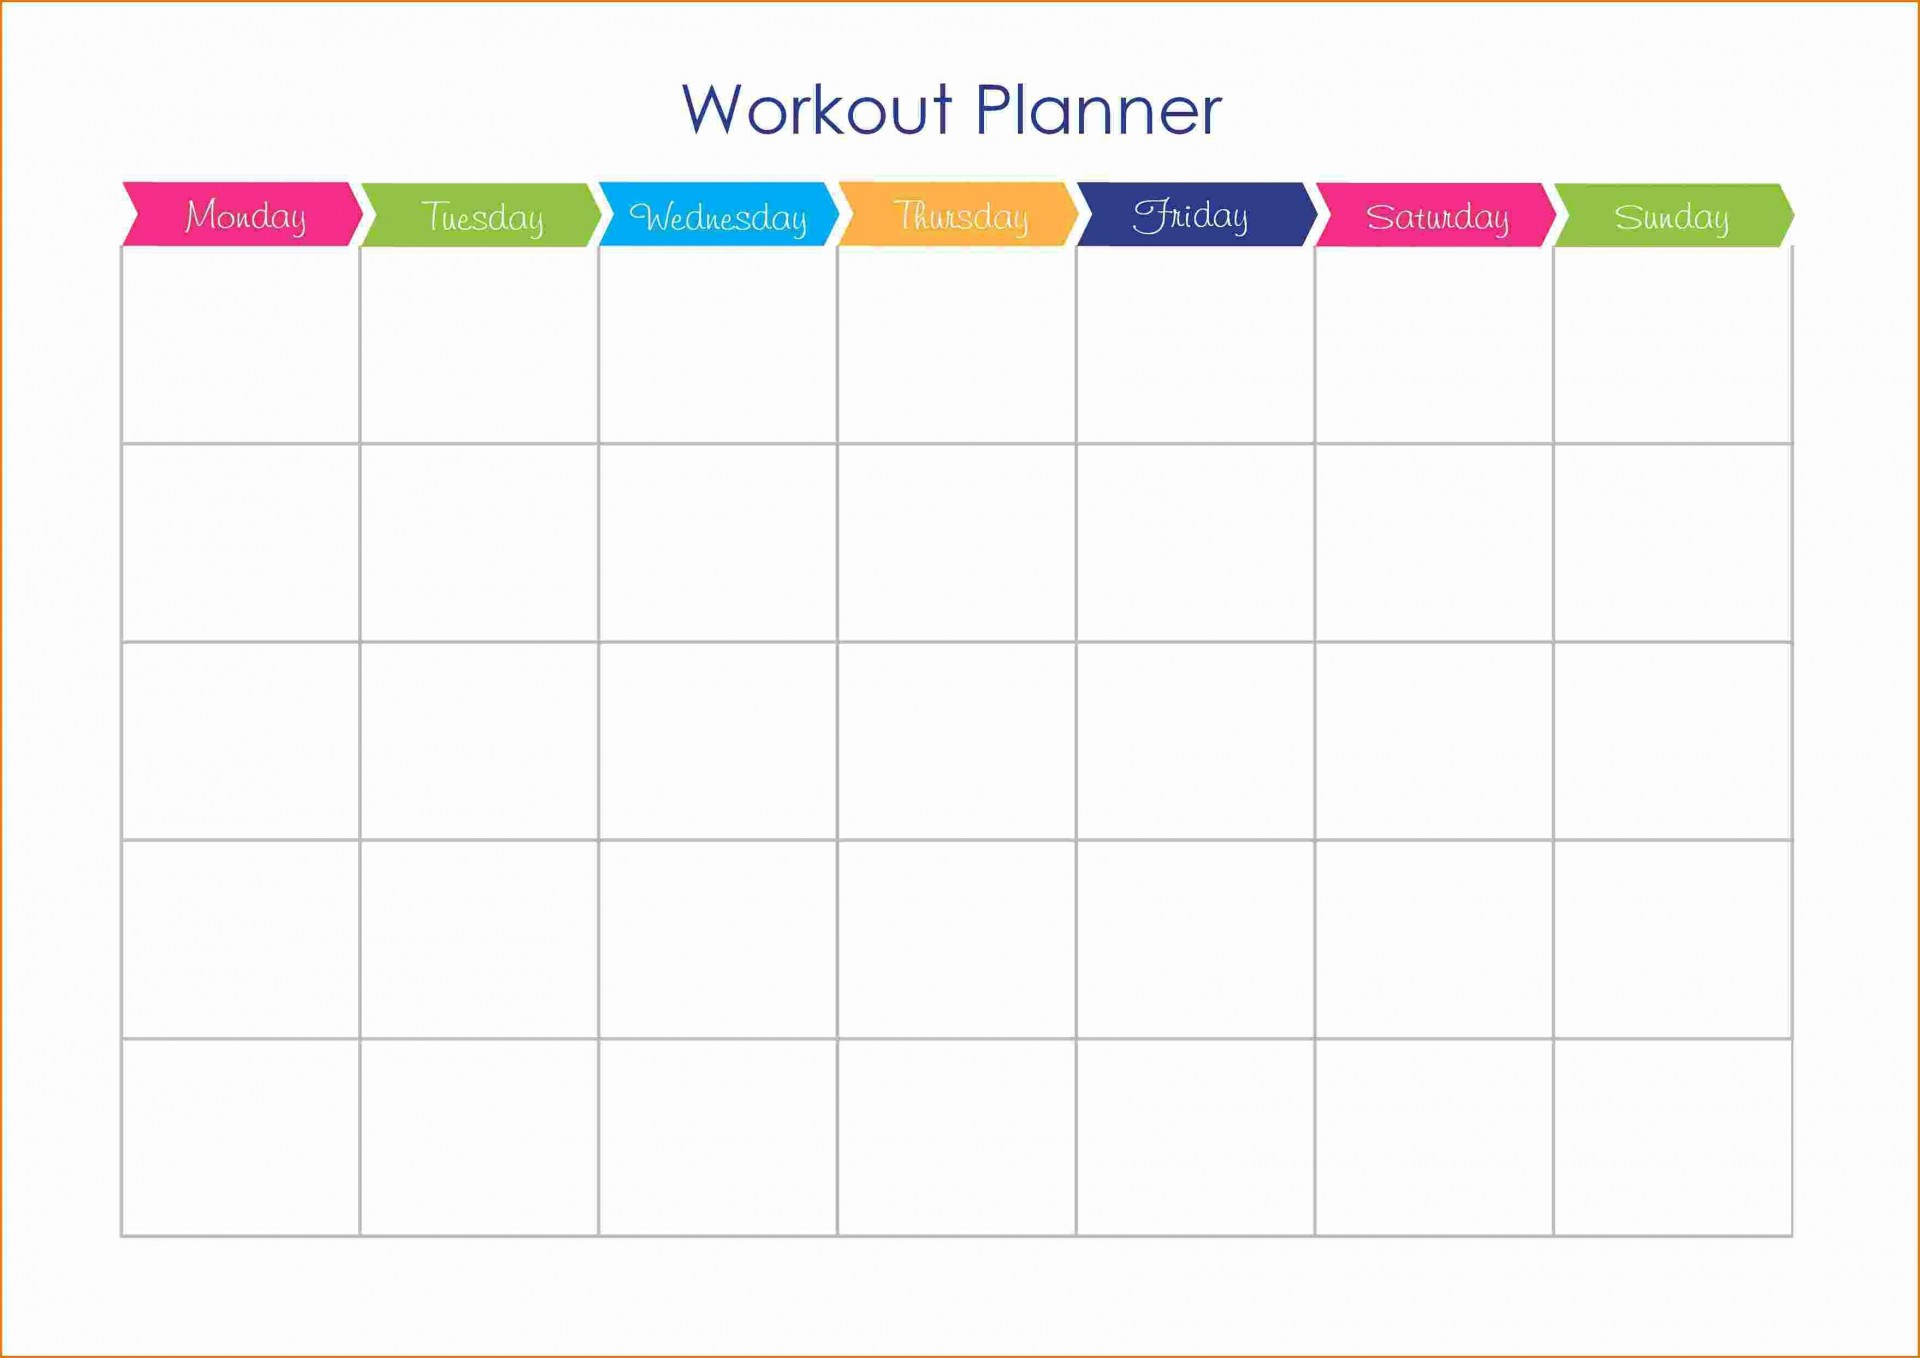 001 Shocking Weekly Workout Schedule Template Inspiration  12 Week Plan Training Calendar1920